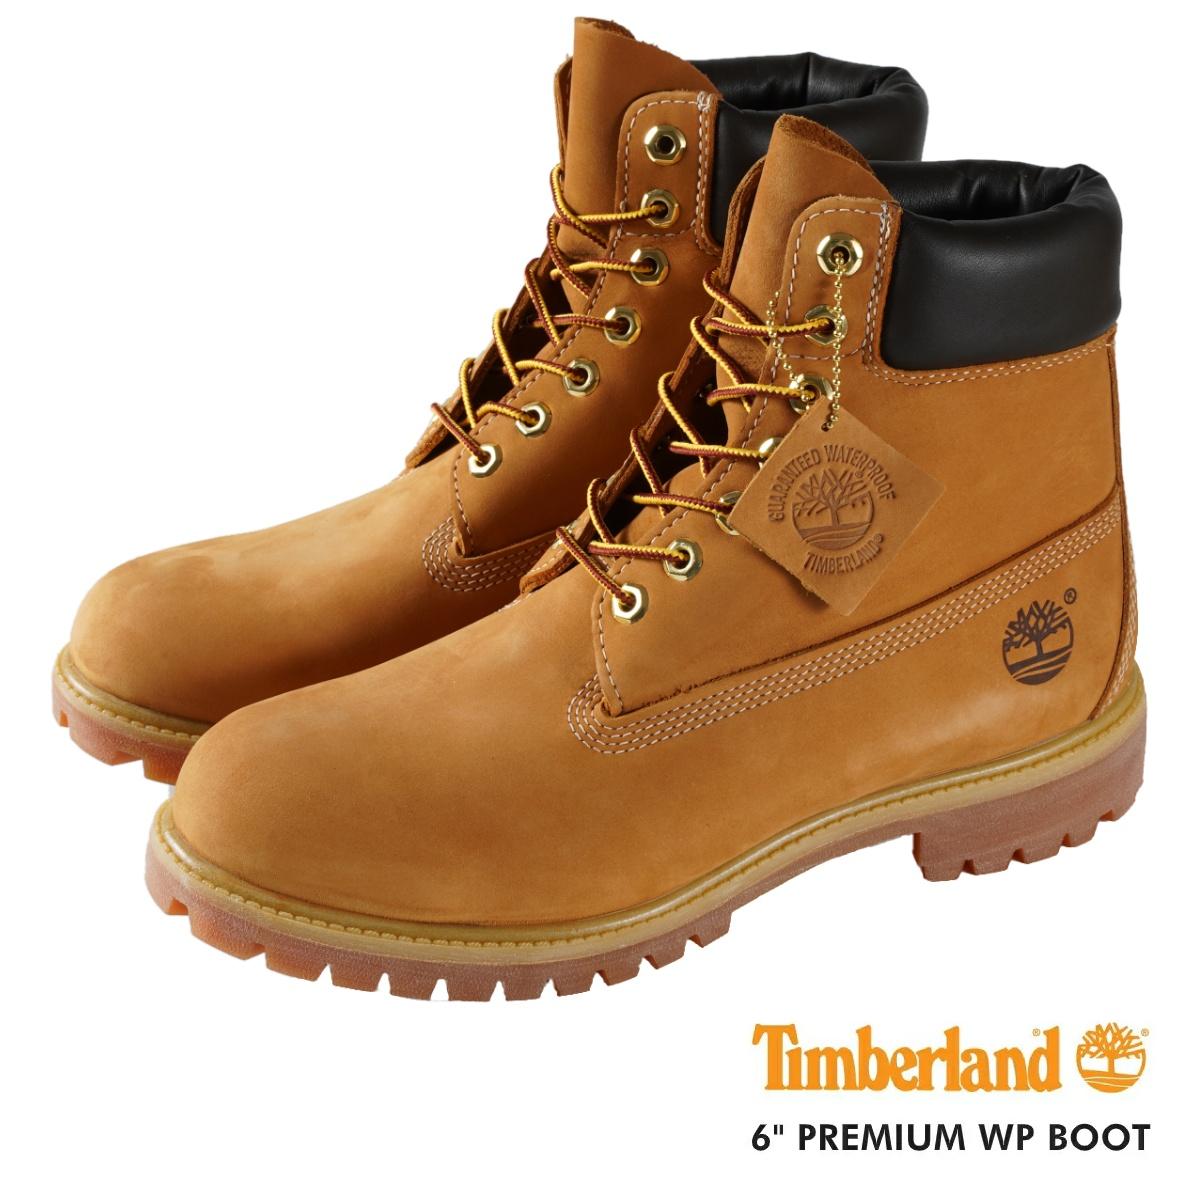 TIMBERLAND 6inch PREMIUM WP BOOT ティンバーランド 6インチ プレミアム ウォータープルーフ ブーツ WHEAT 10061